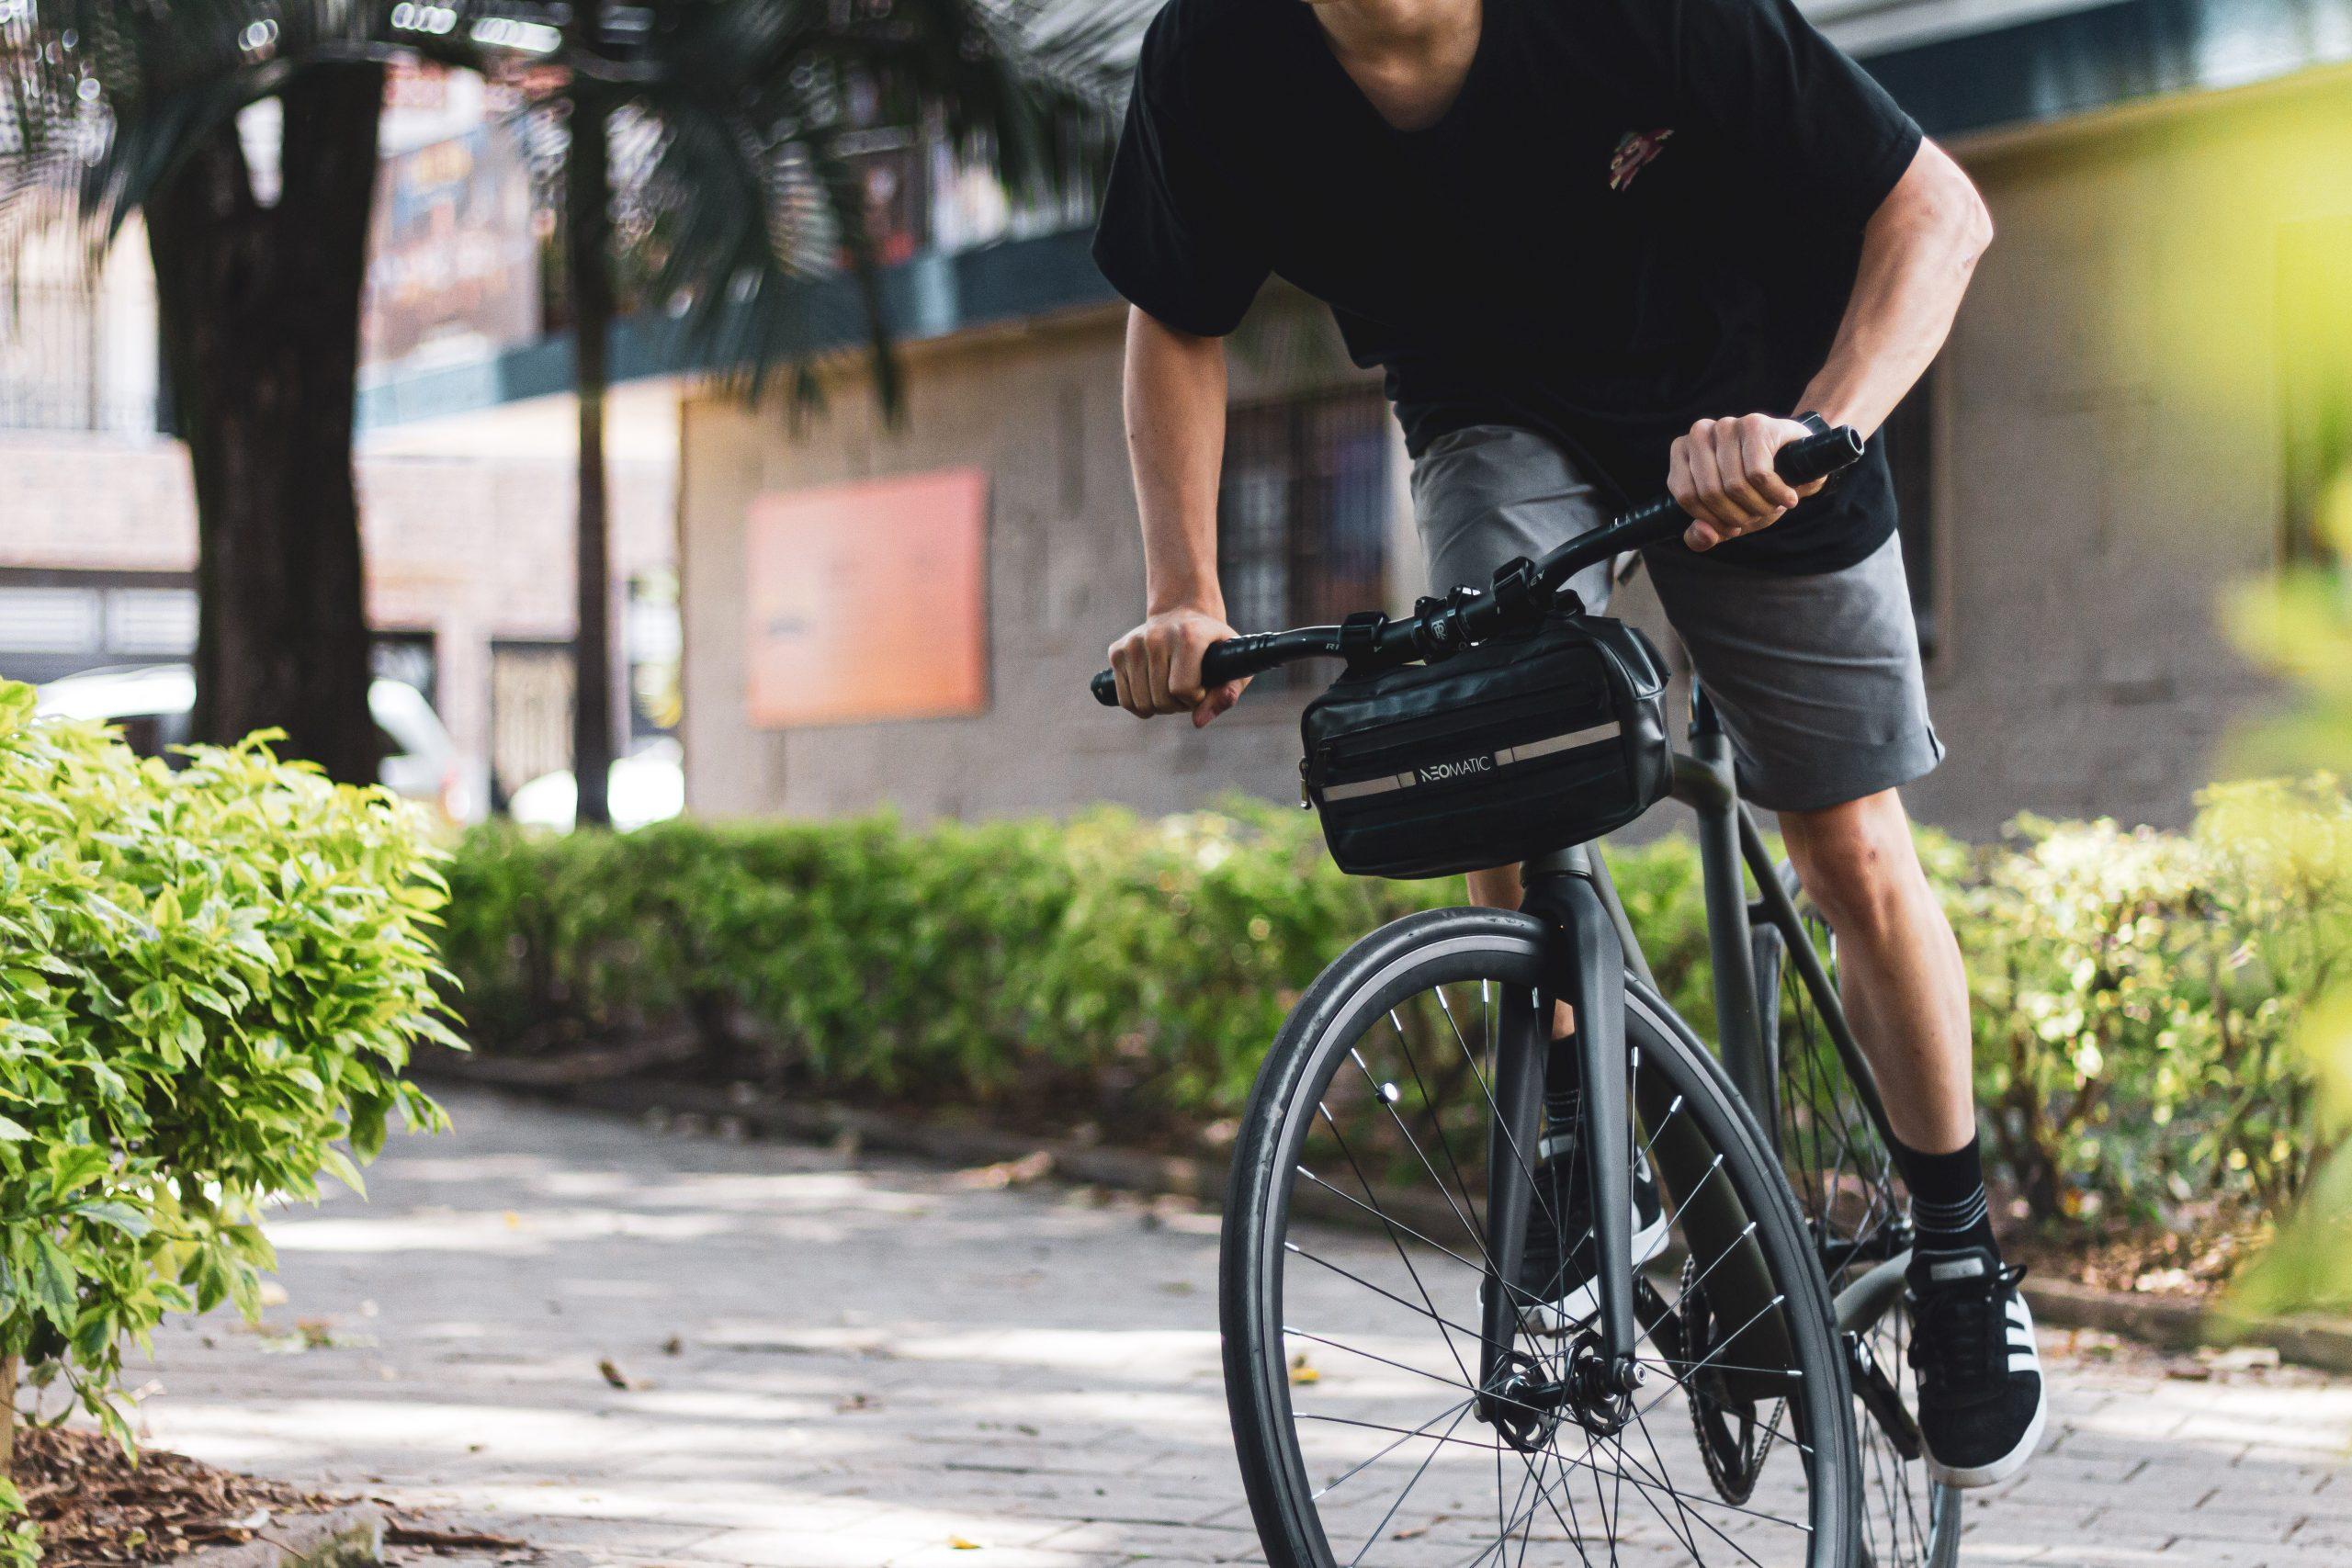 NeoMatic B.O.B I bikebag piñon fijo fixed gear